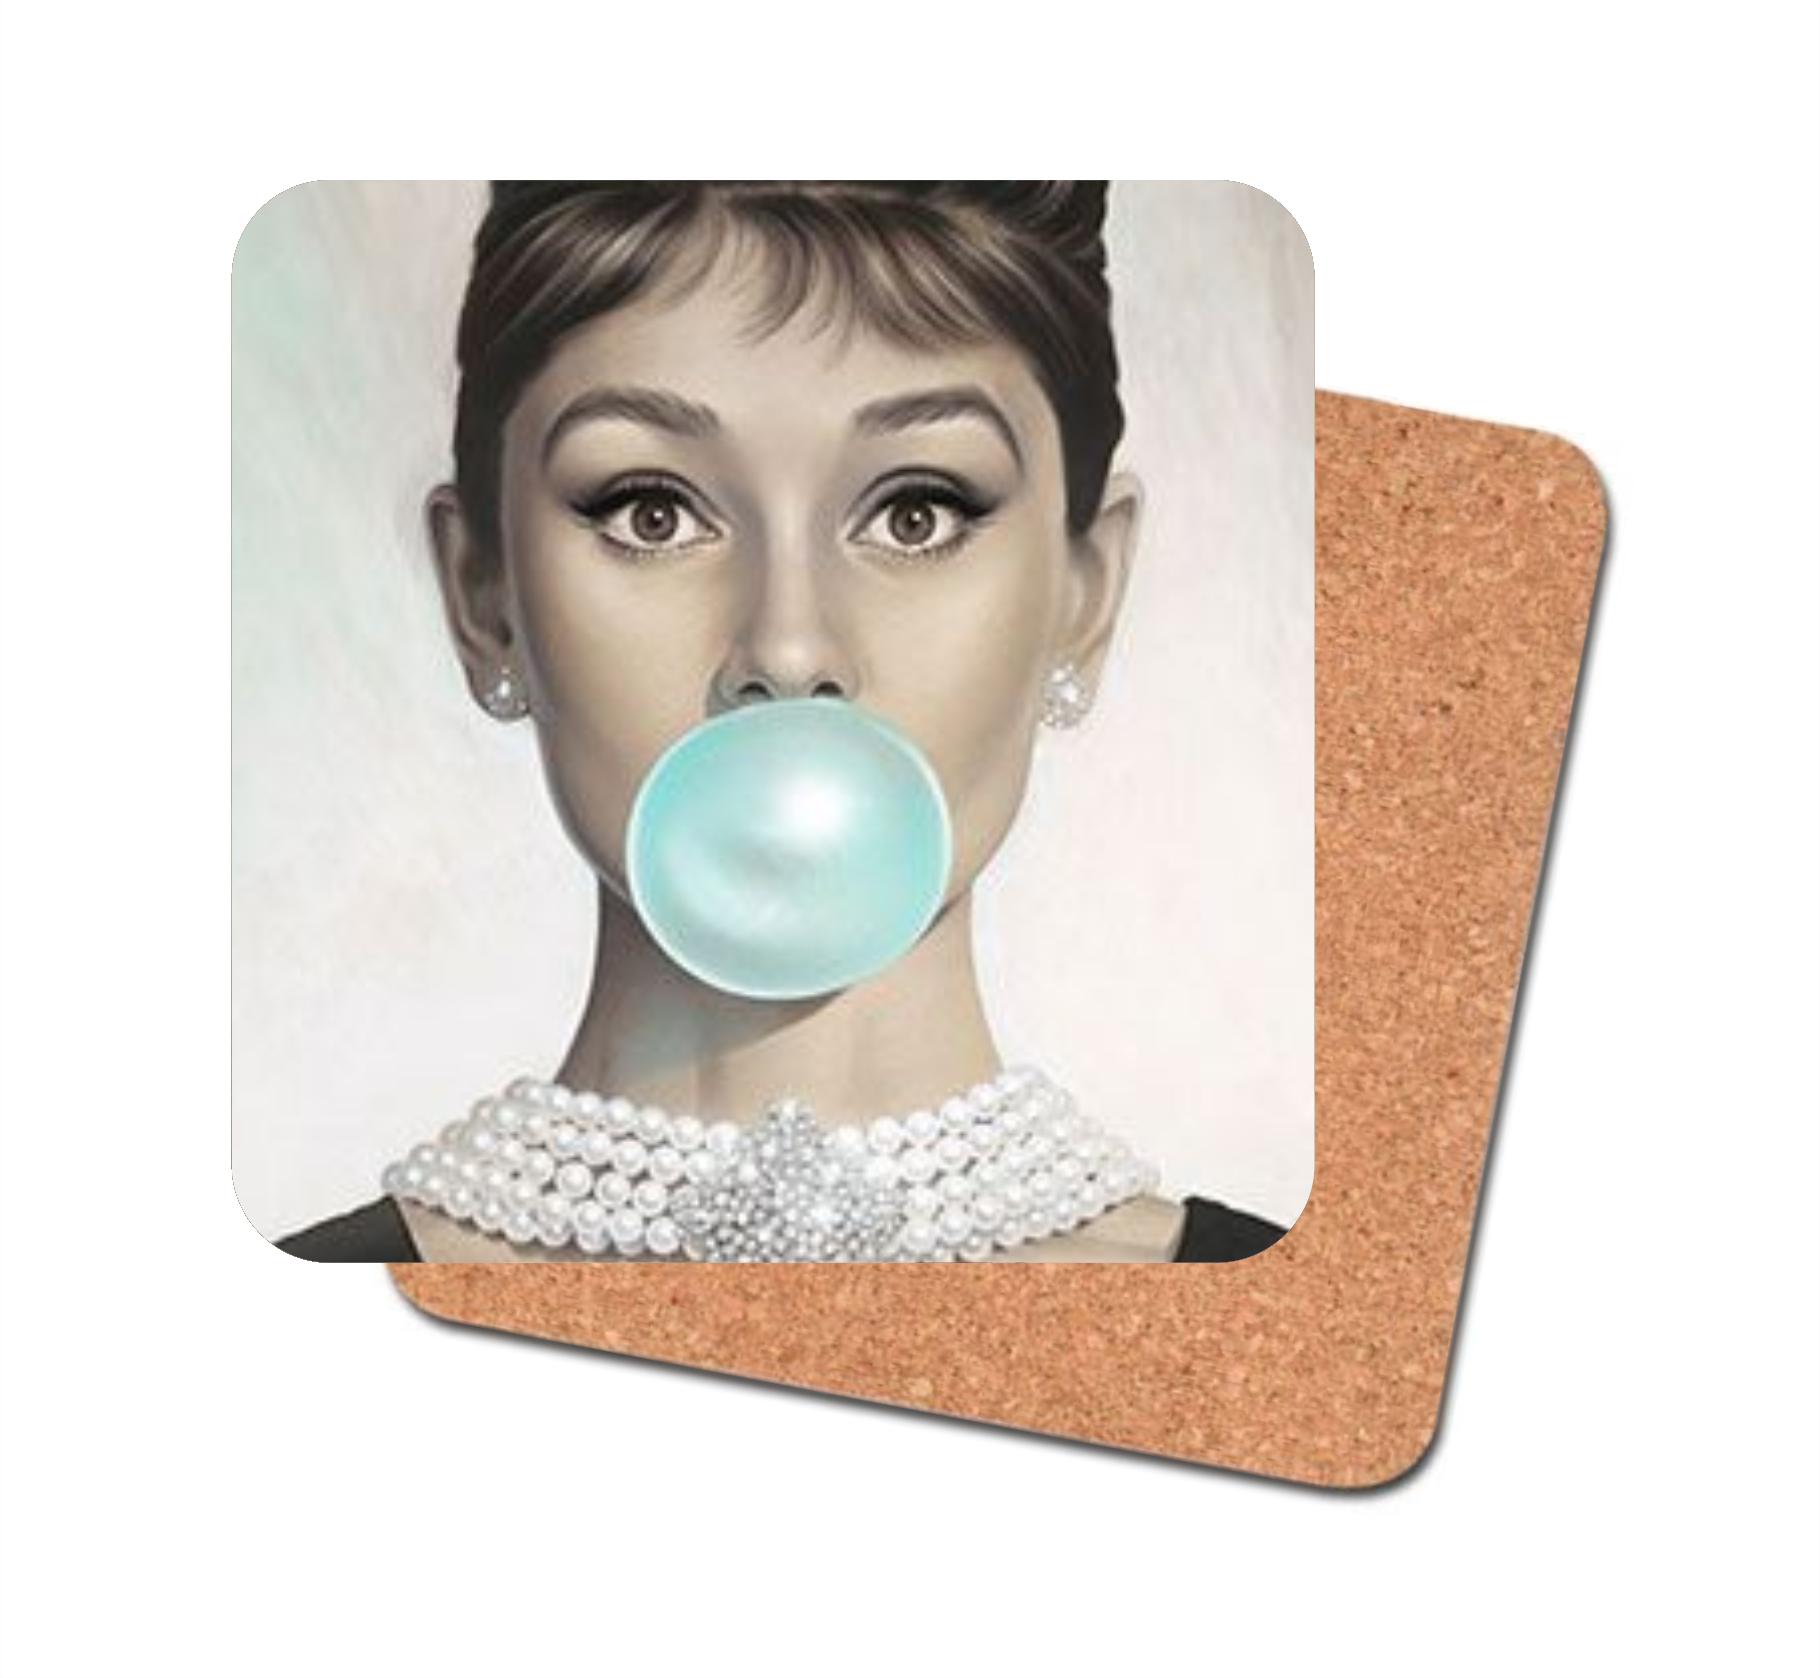 Audrey Hepburn Coaster Audrey hepburn, Audrey hepburn